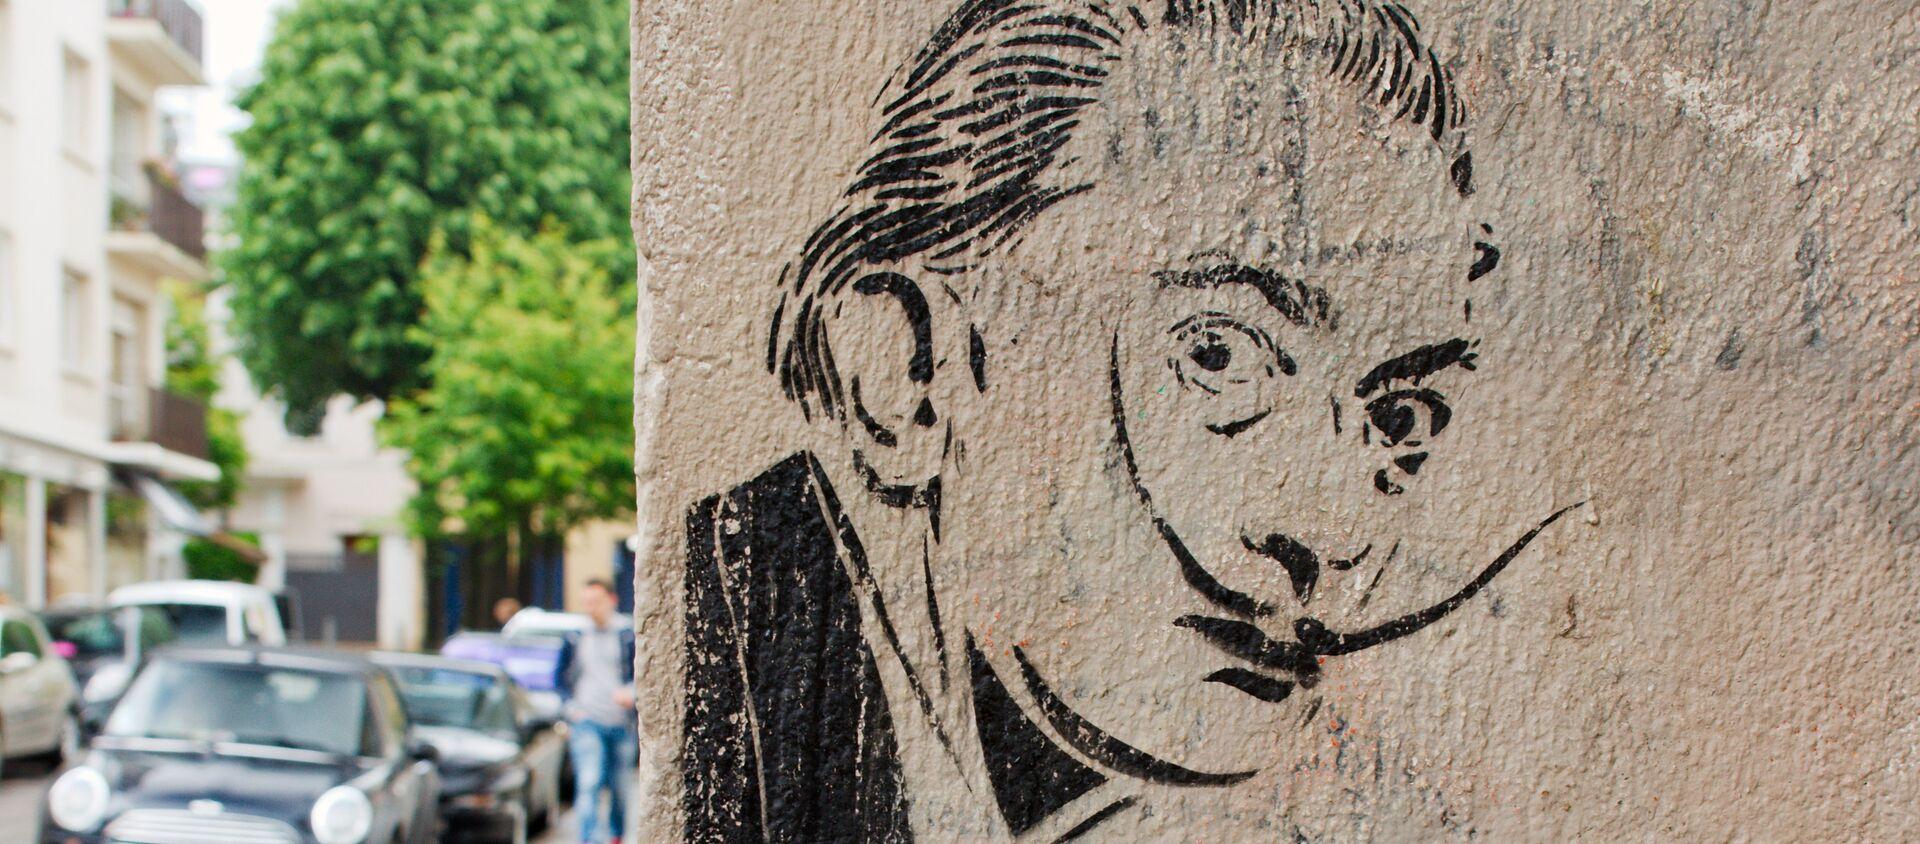 Un graffiti con el retrato de Salvador Dalí - Sputnik Mundo, 1920, 21.07.2017